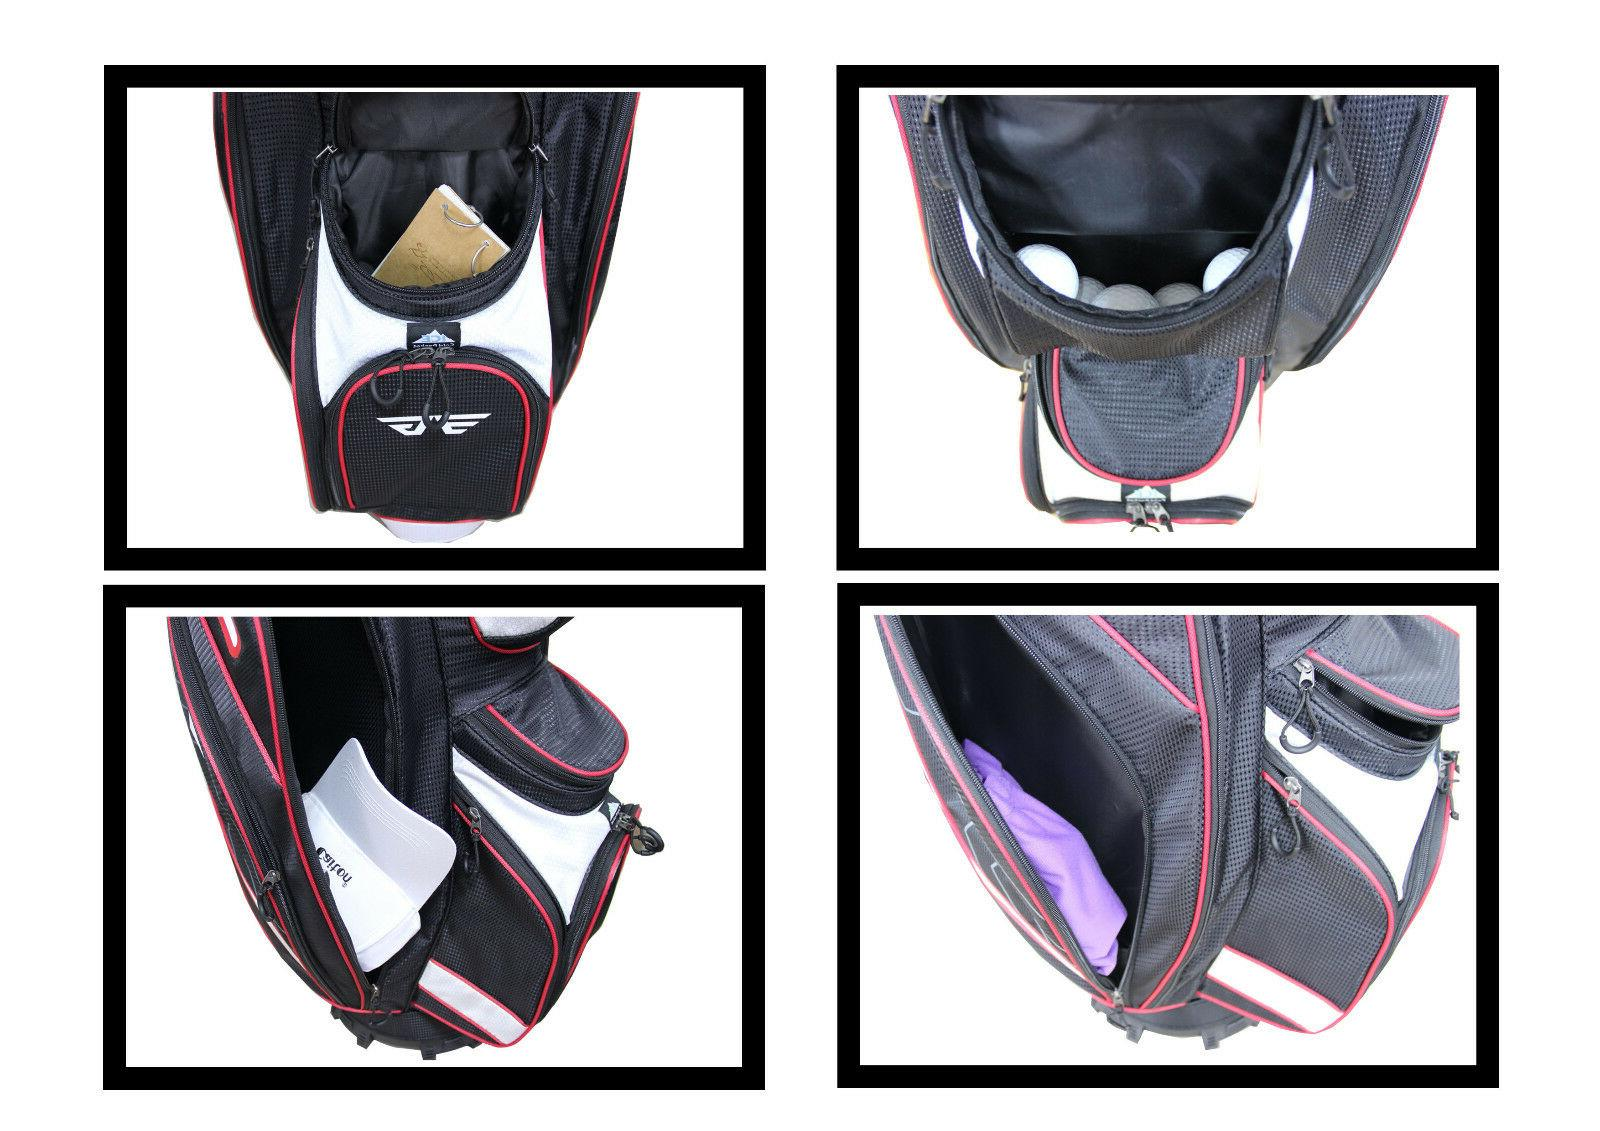 EG Eagole 14 Way Full Length Divider,10 Pockets Golf